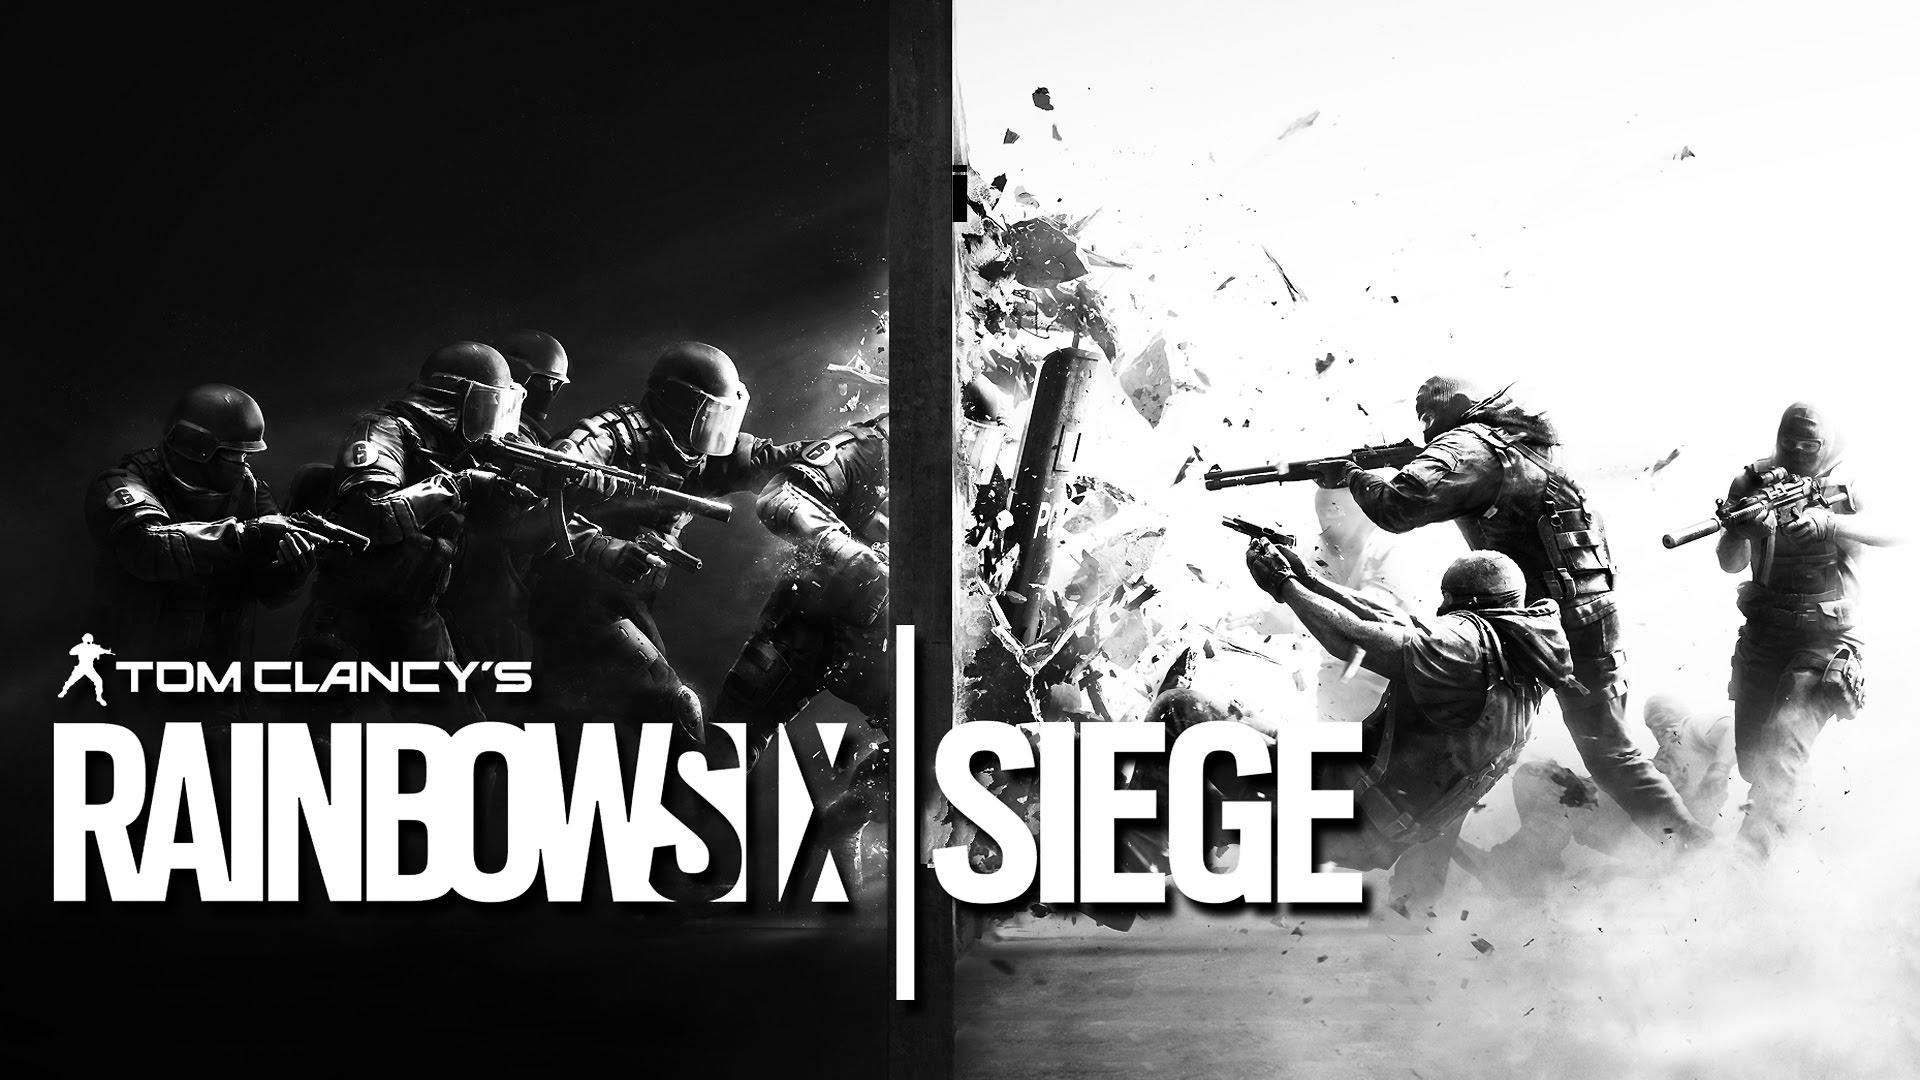 Tom Clancy's Rainbow Six Siege PC Uplay Code $17.82 @ uk.gamesplanet.com